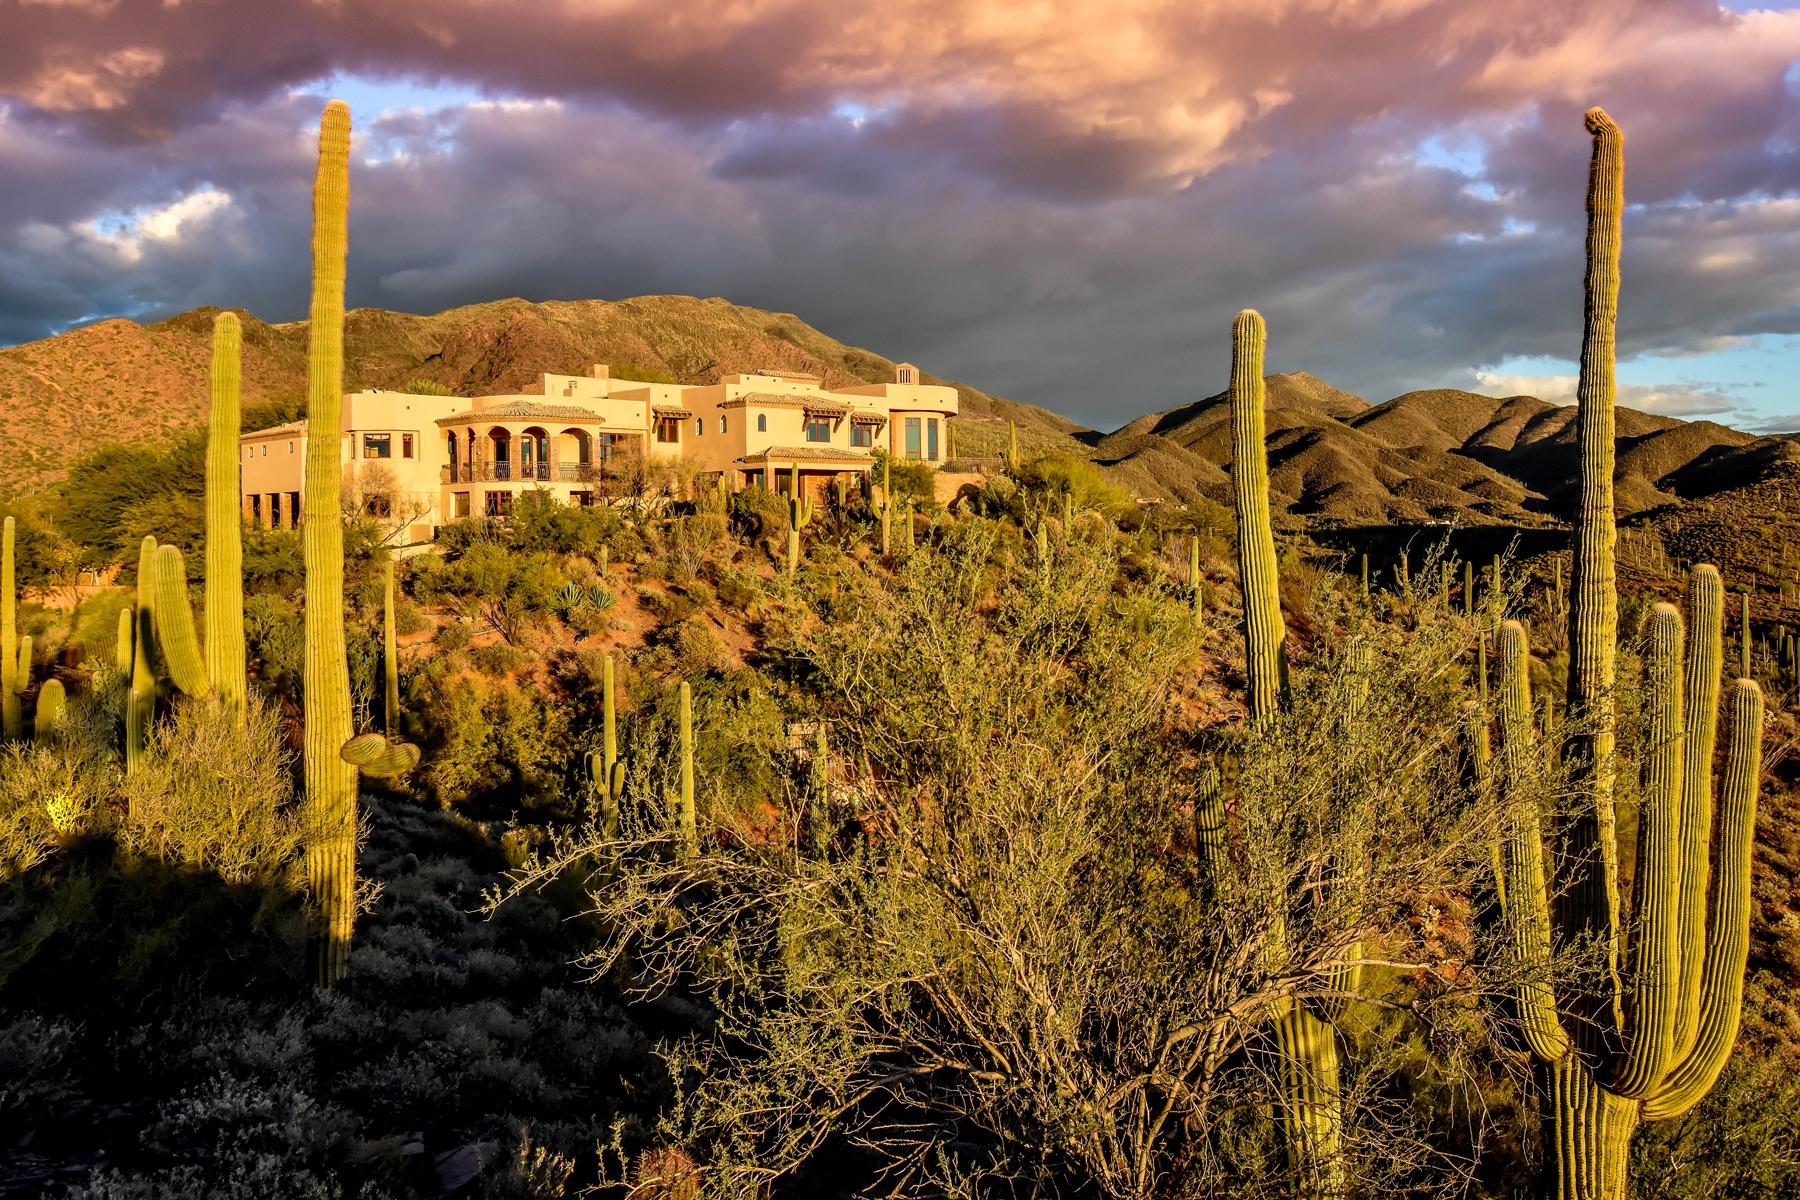 Casa Unifamiliar por un Venta en Phoenix area's most secluded and private gated mountaintop estate 42820 N Fleming Springs Rd Cave Creek, Arizona 85331 Estados Unidos